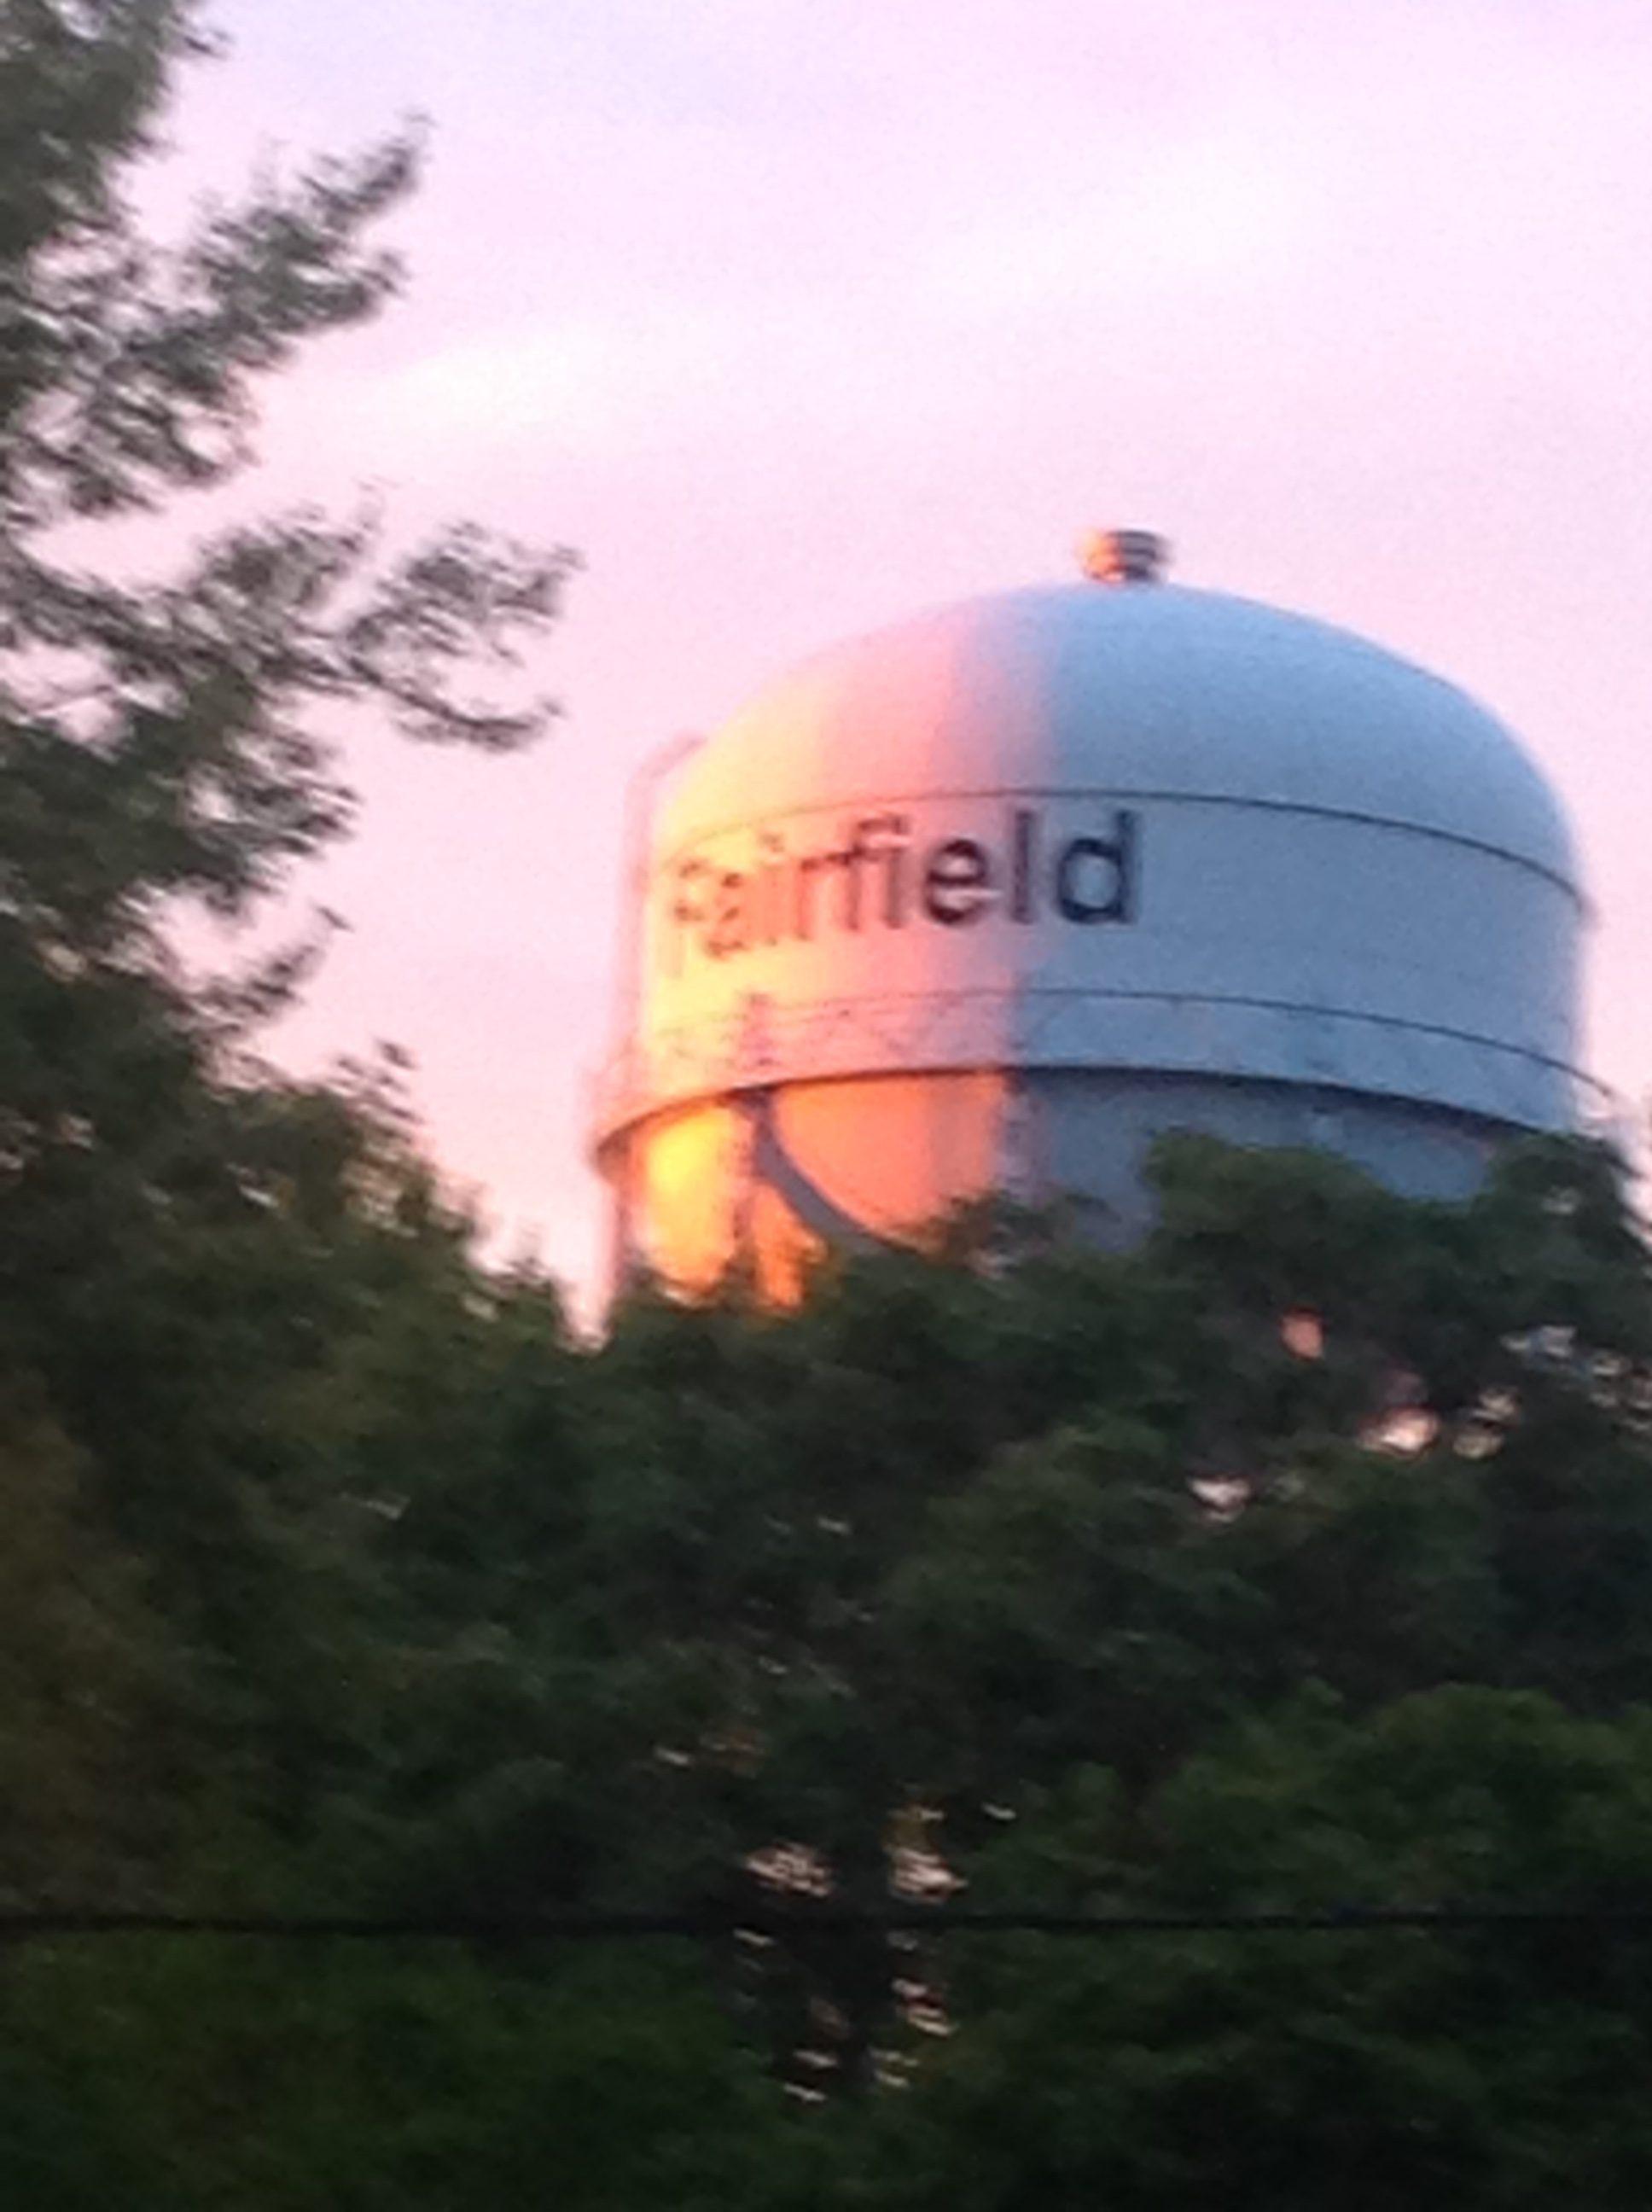 Fairfield on the Web – Were putting Fairfield on the Web.